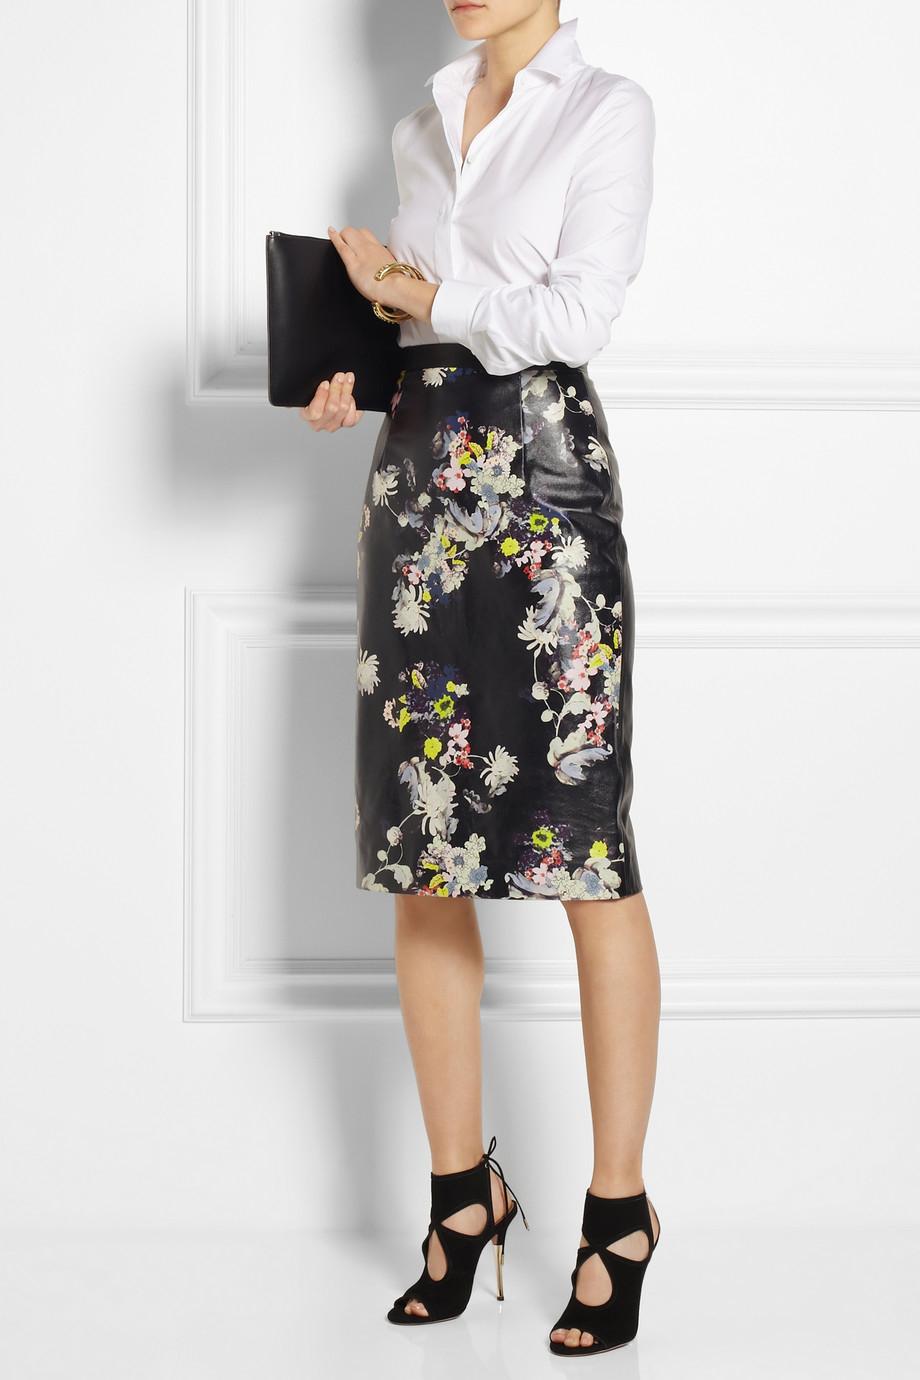 Erdem Aysha Floral-Print Leather Pencil Skirt in Black | Lyst